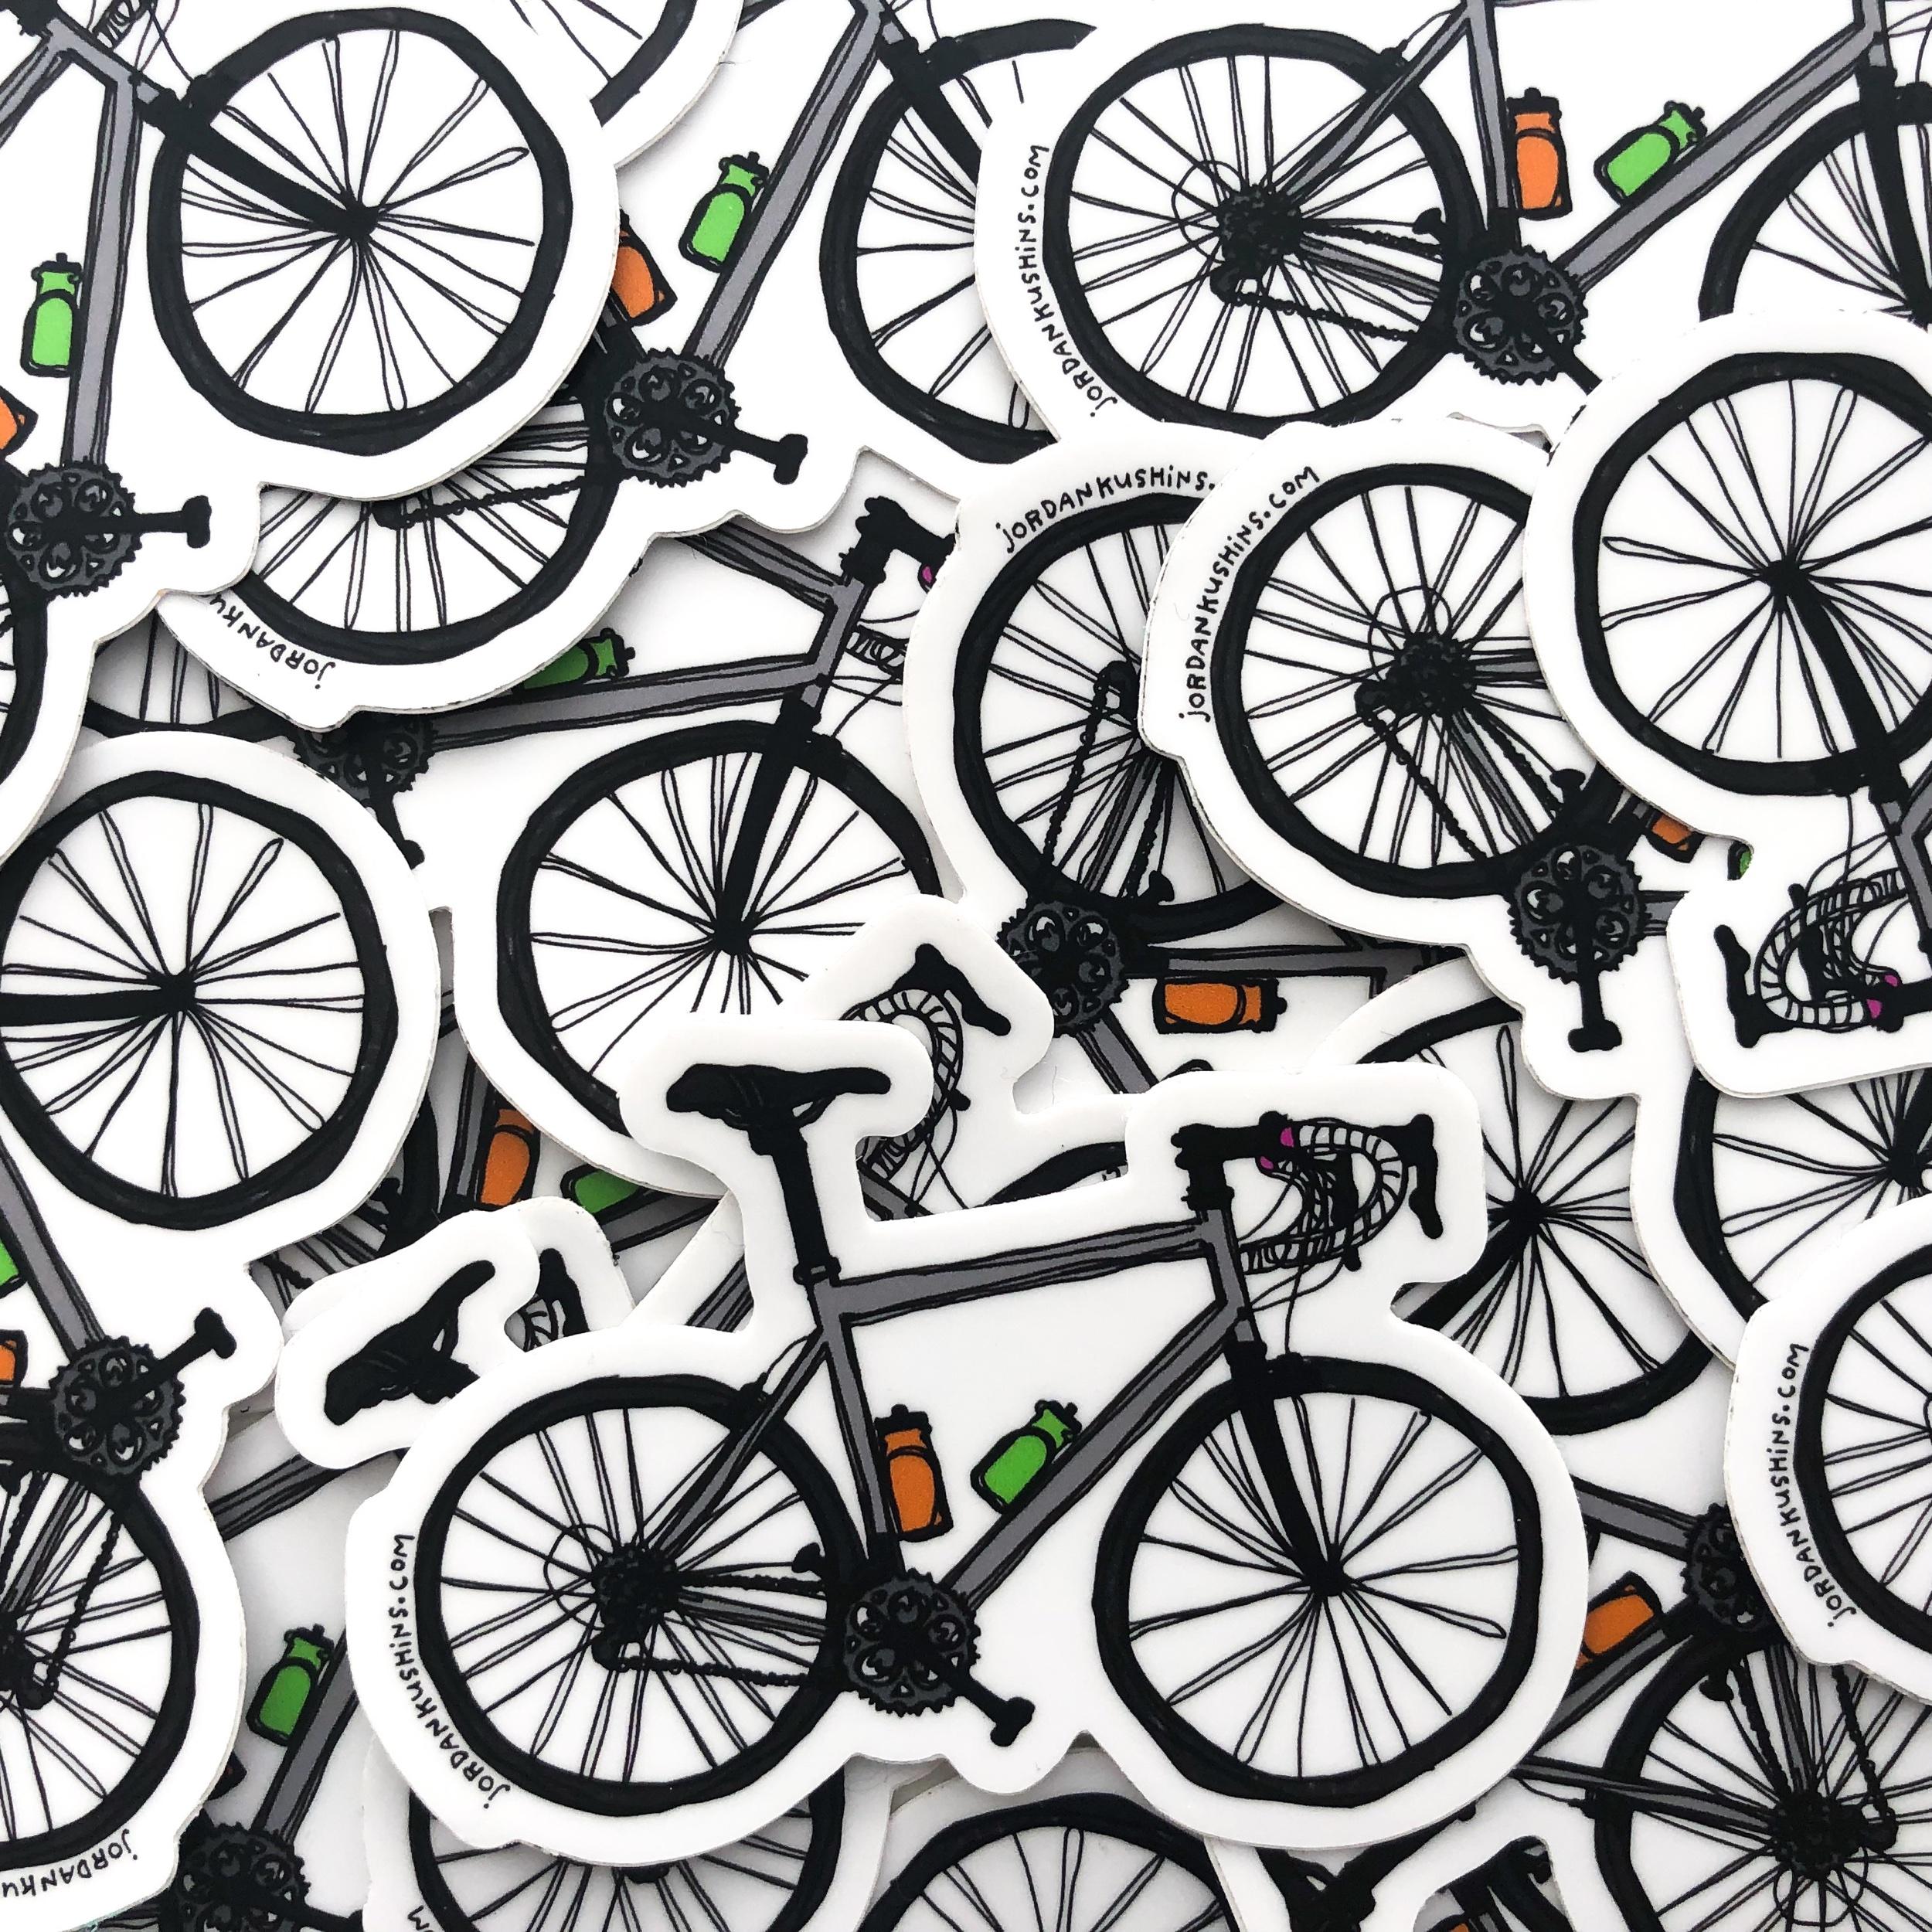 jordan_kushins_bike_stickers.jpeg